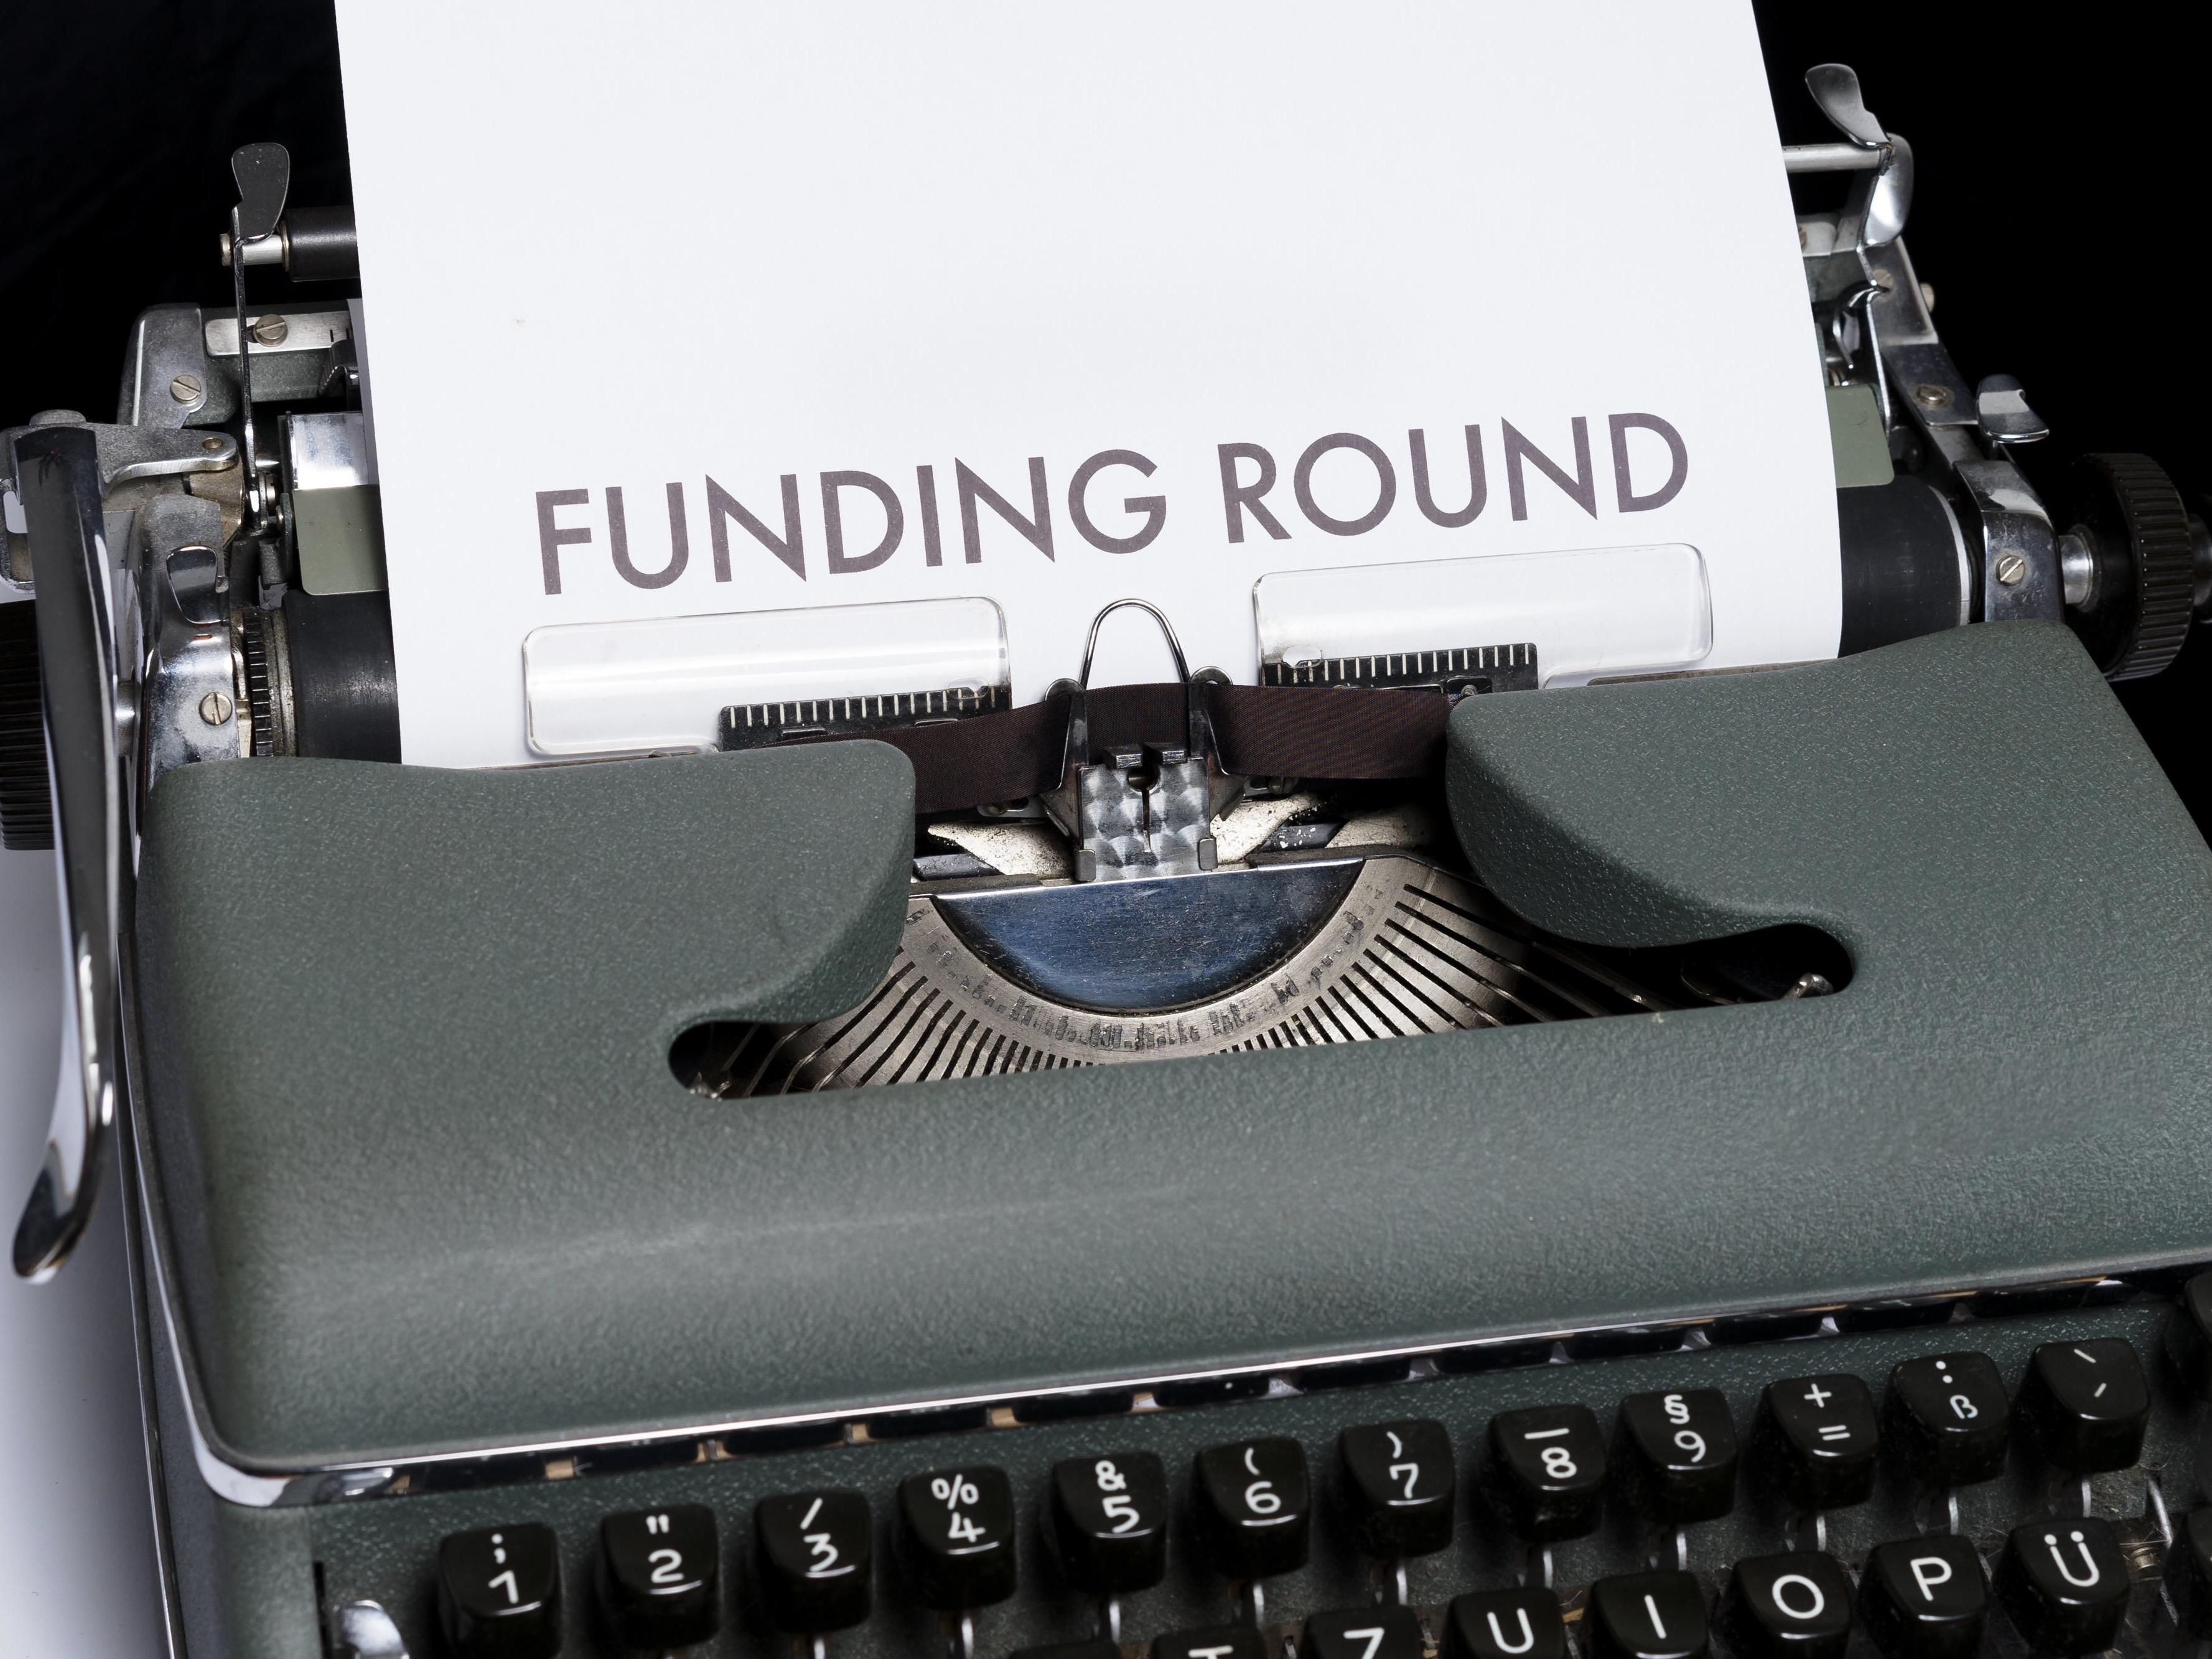 Funding round. Image credit: Markus Winkler/Unsplash